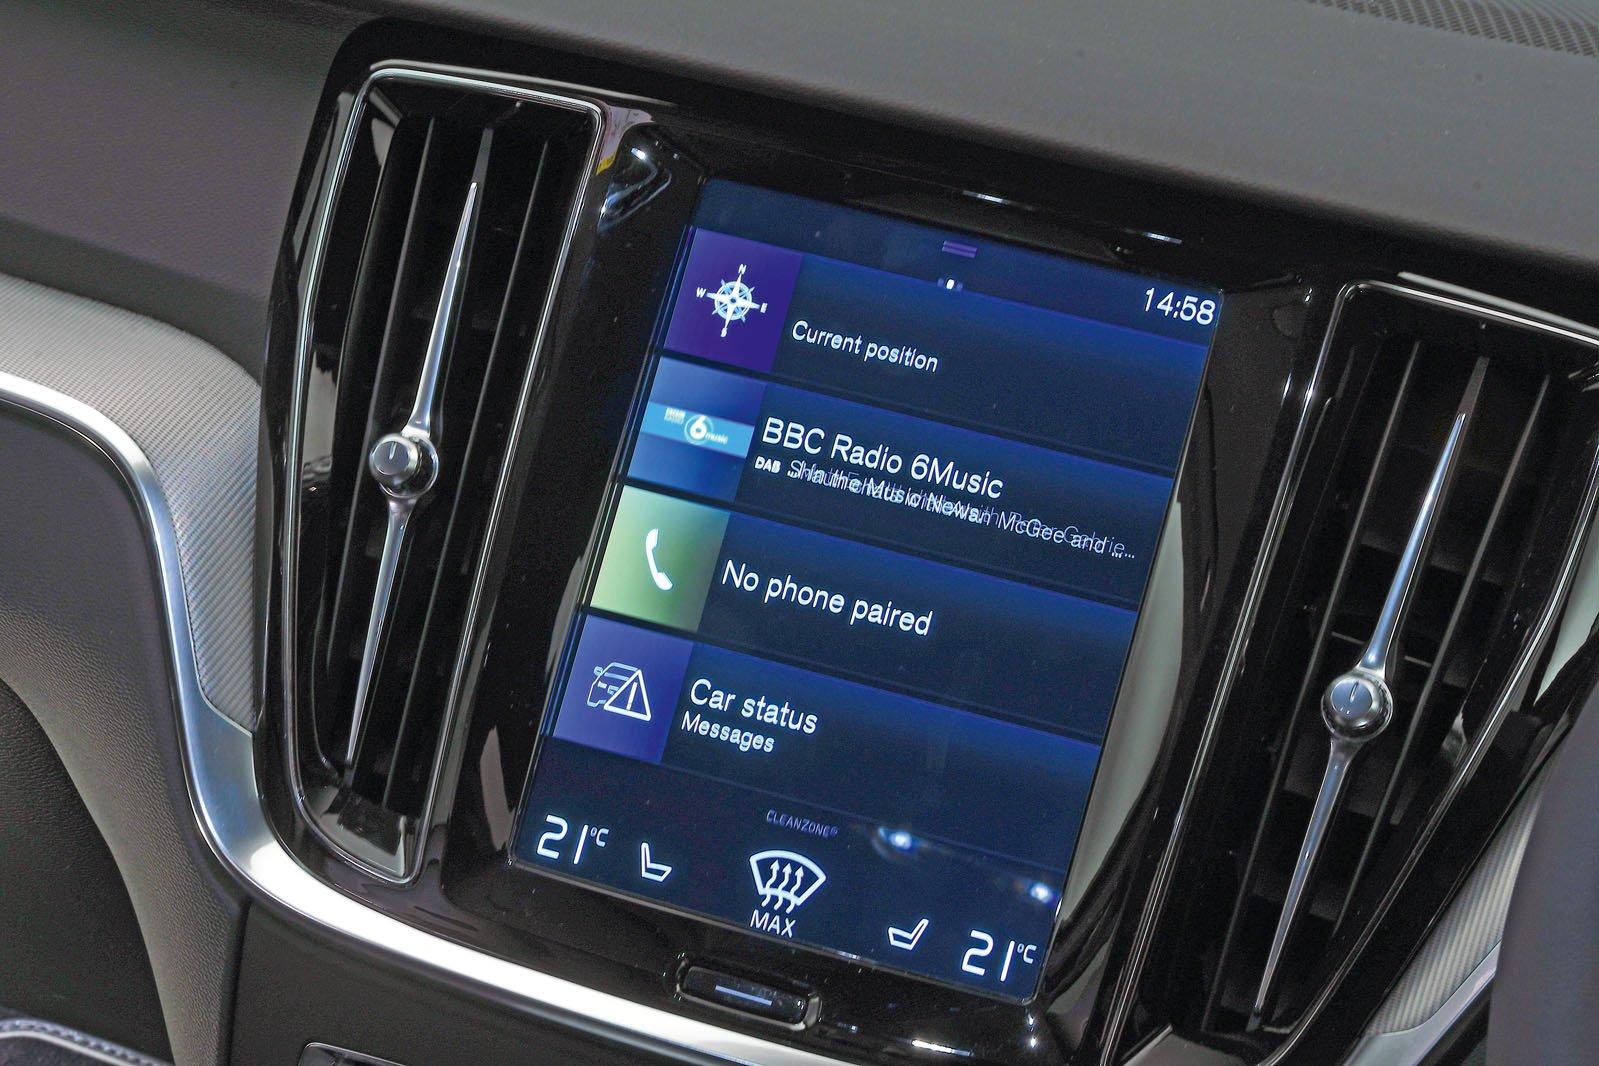 Volvo S60 infotainment